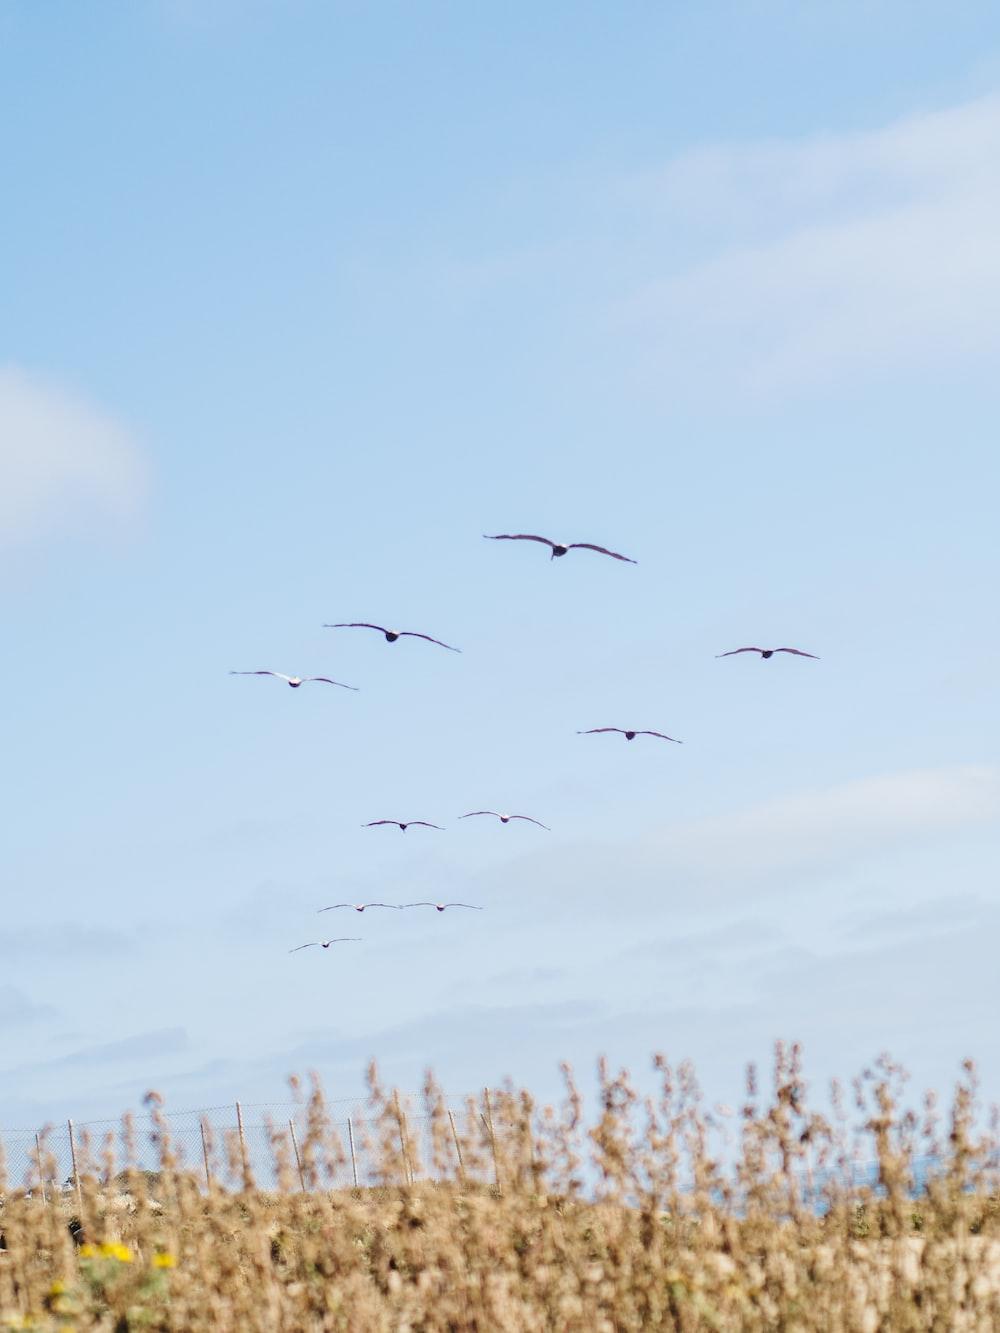 school of bird flying during daytime